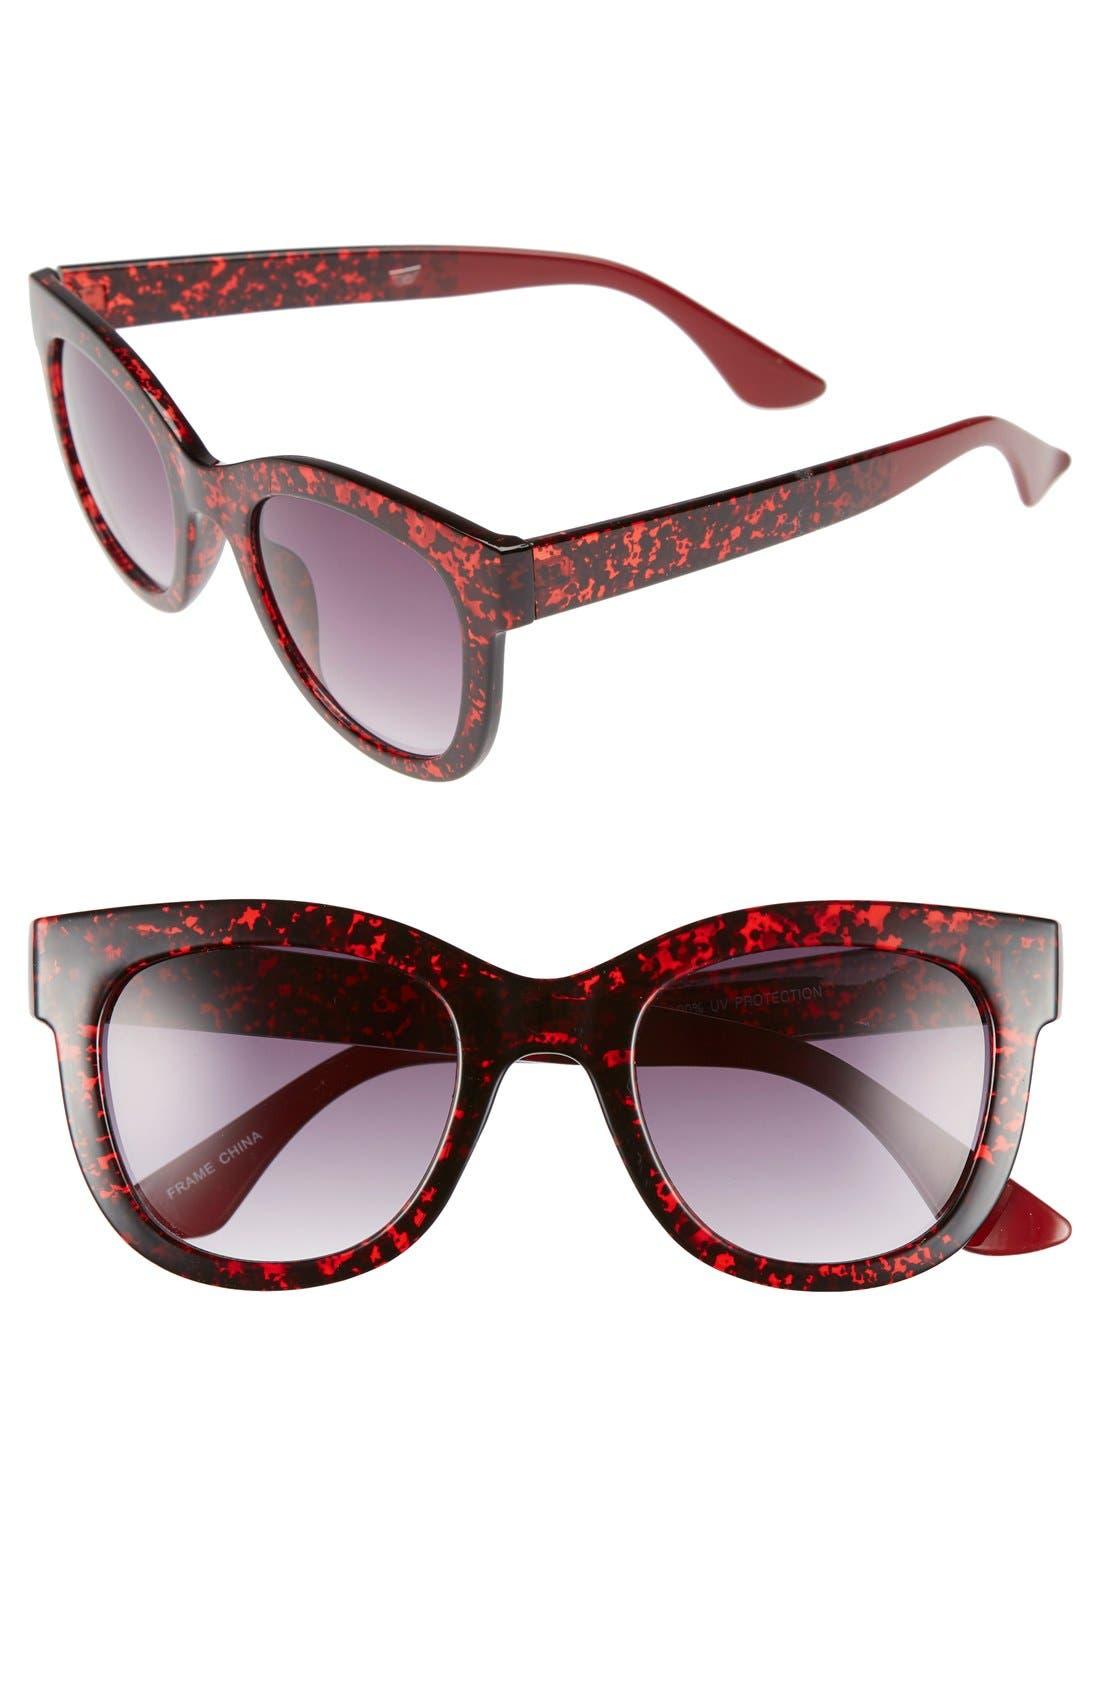 Alternate Image 1 Selected - Fantas Eyes 50mm Retro Sunglasses